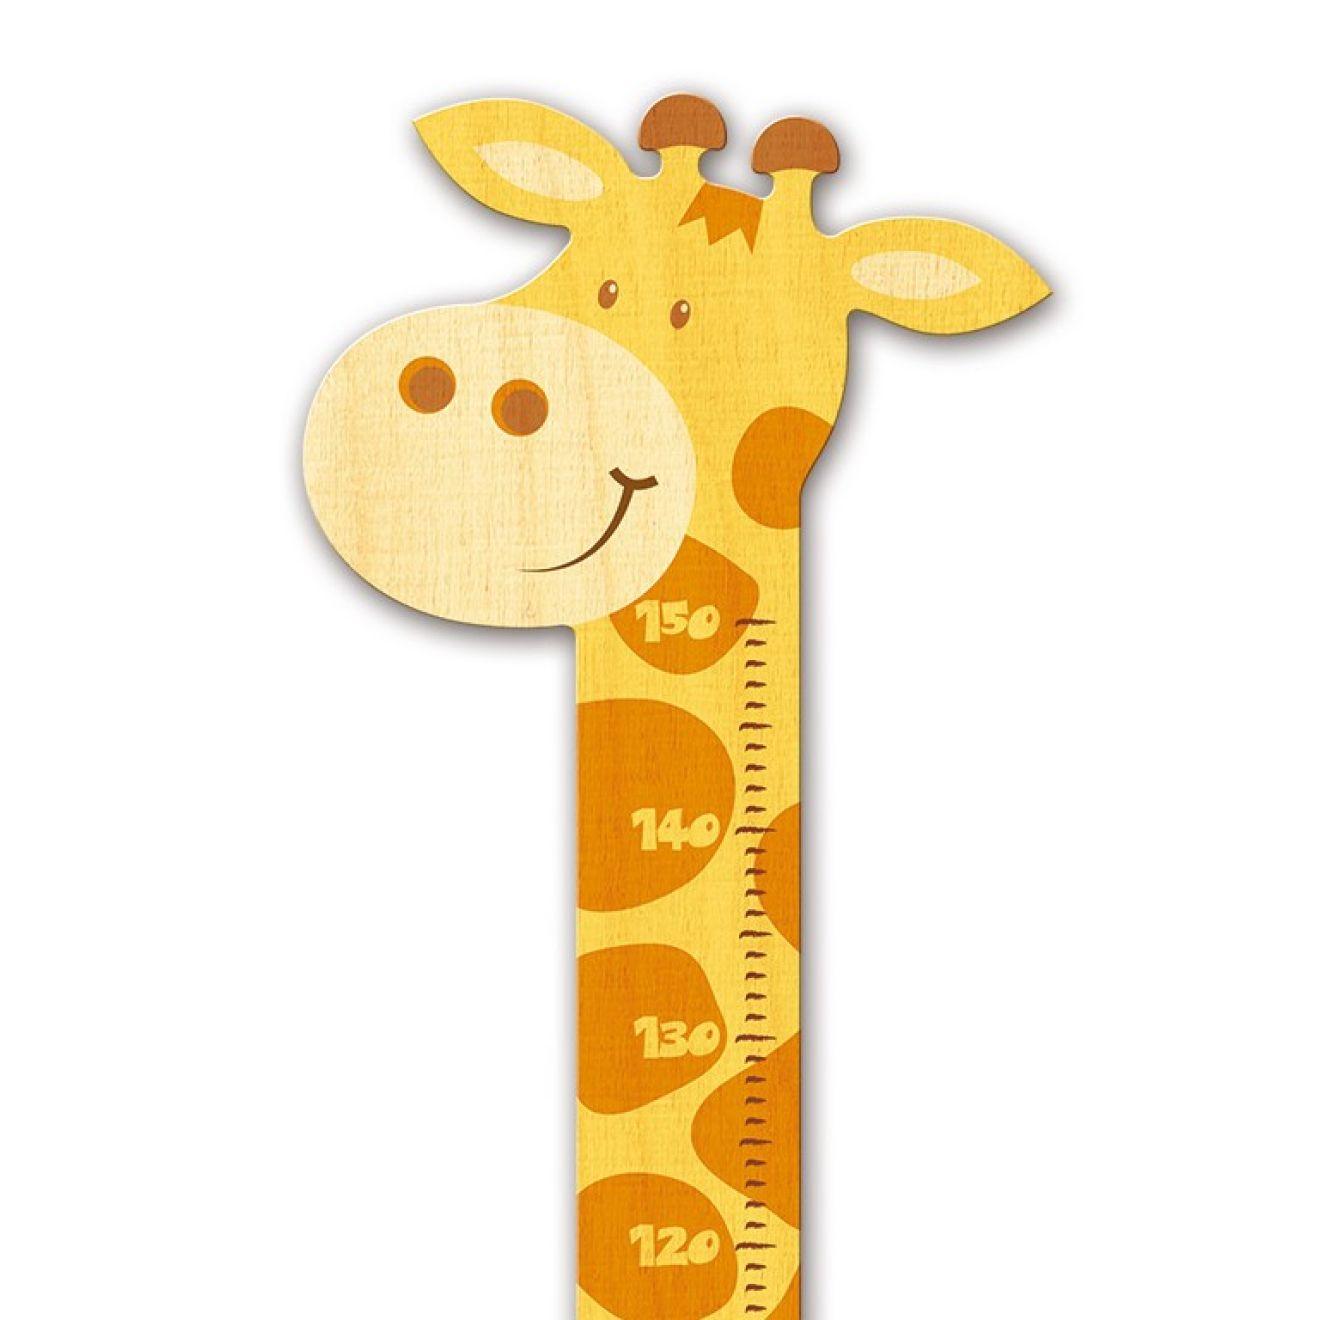 7. Messlatte Kind Giraffe Für Kinder Aus Holz Kinderzimmer .